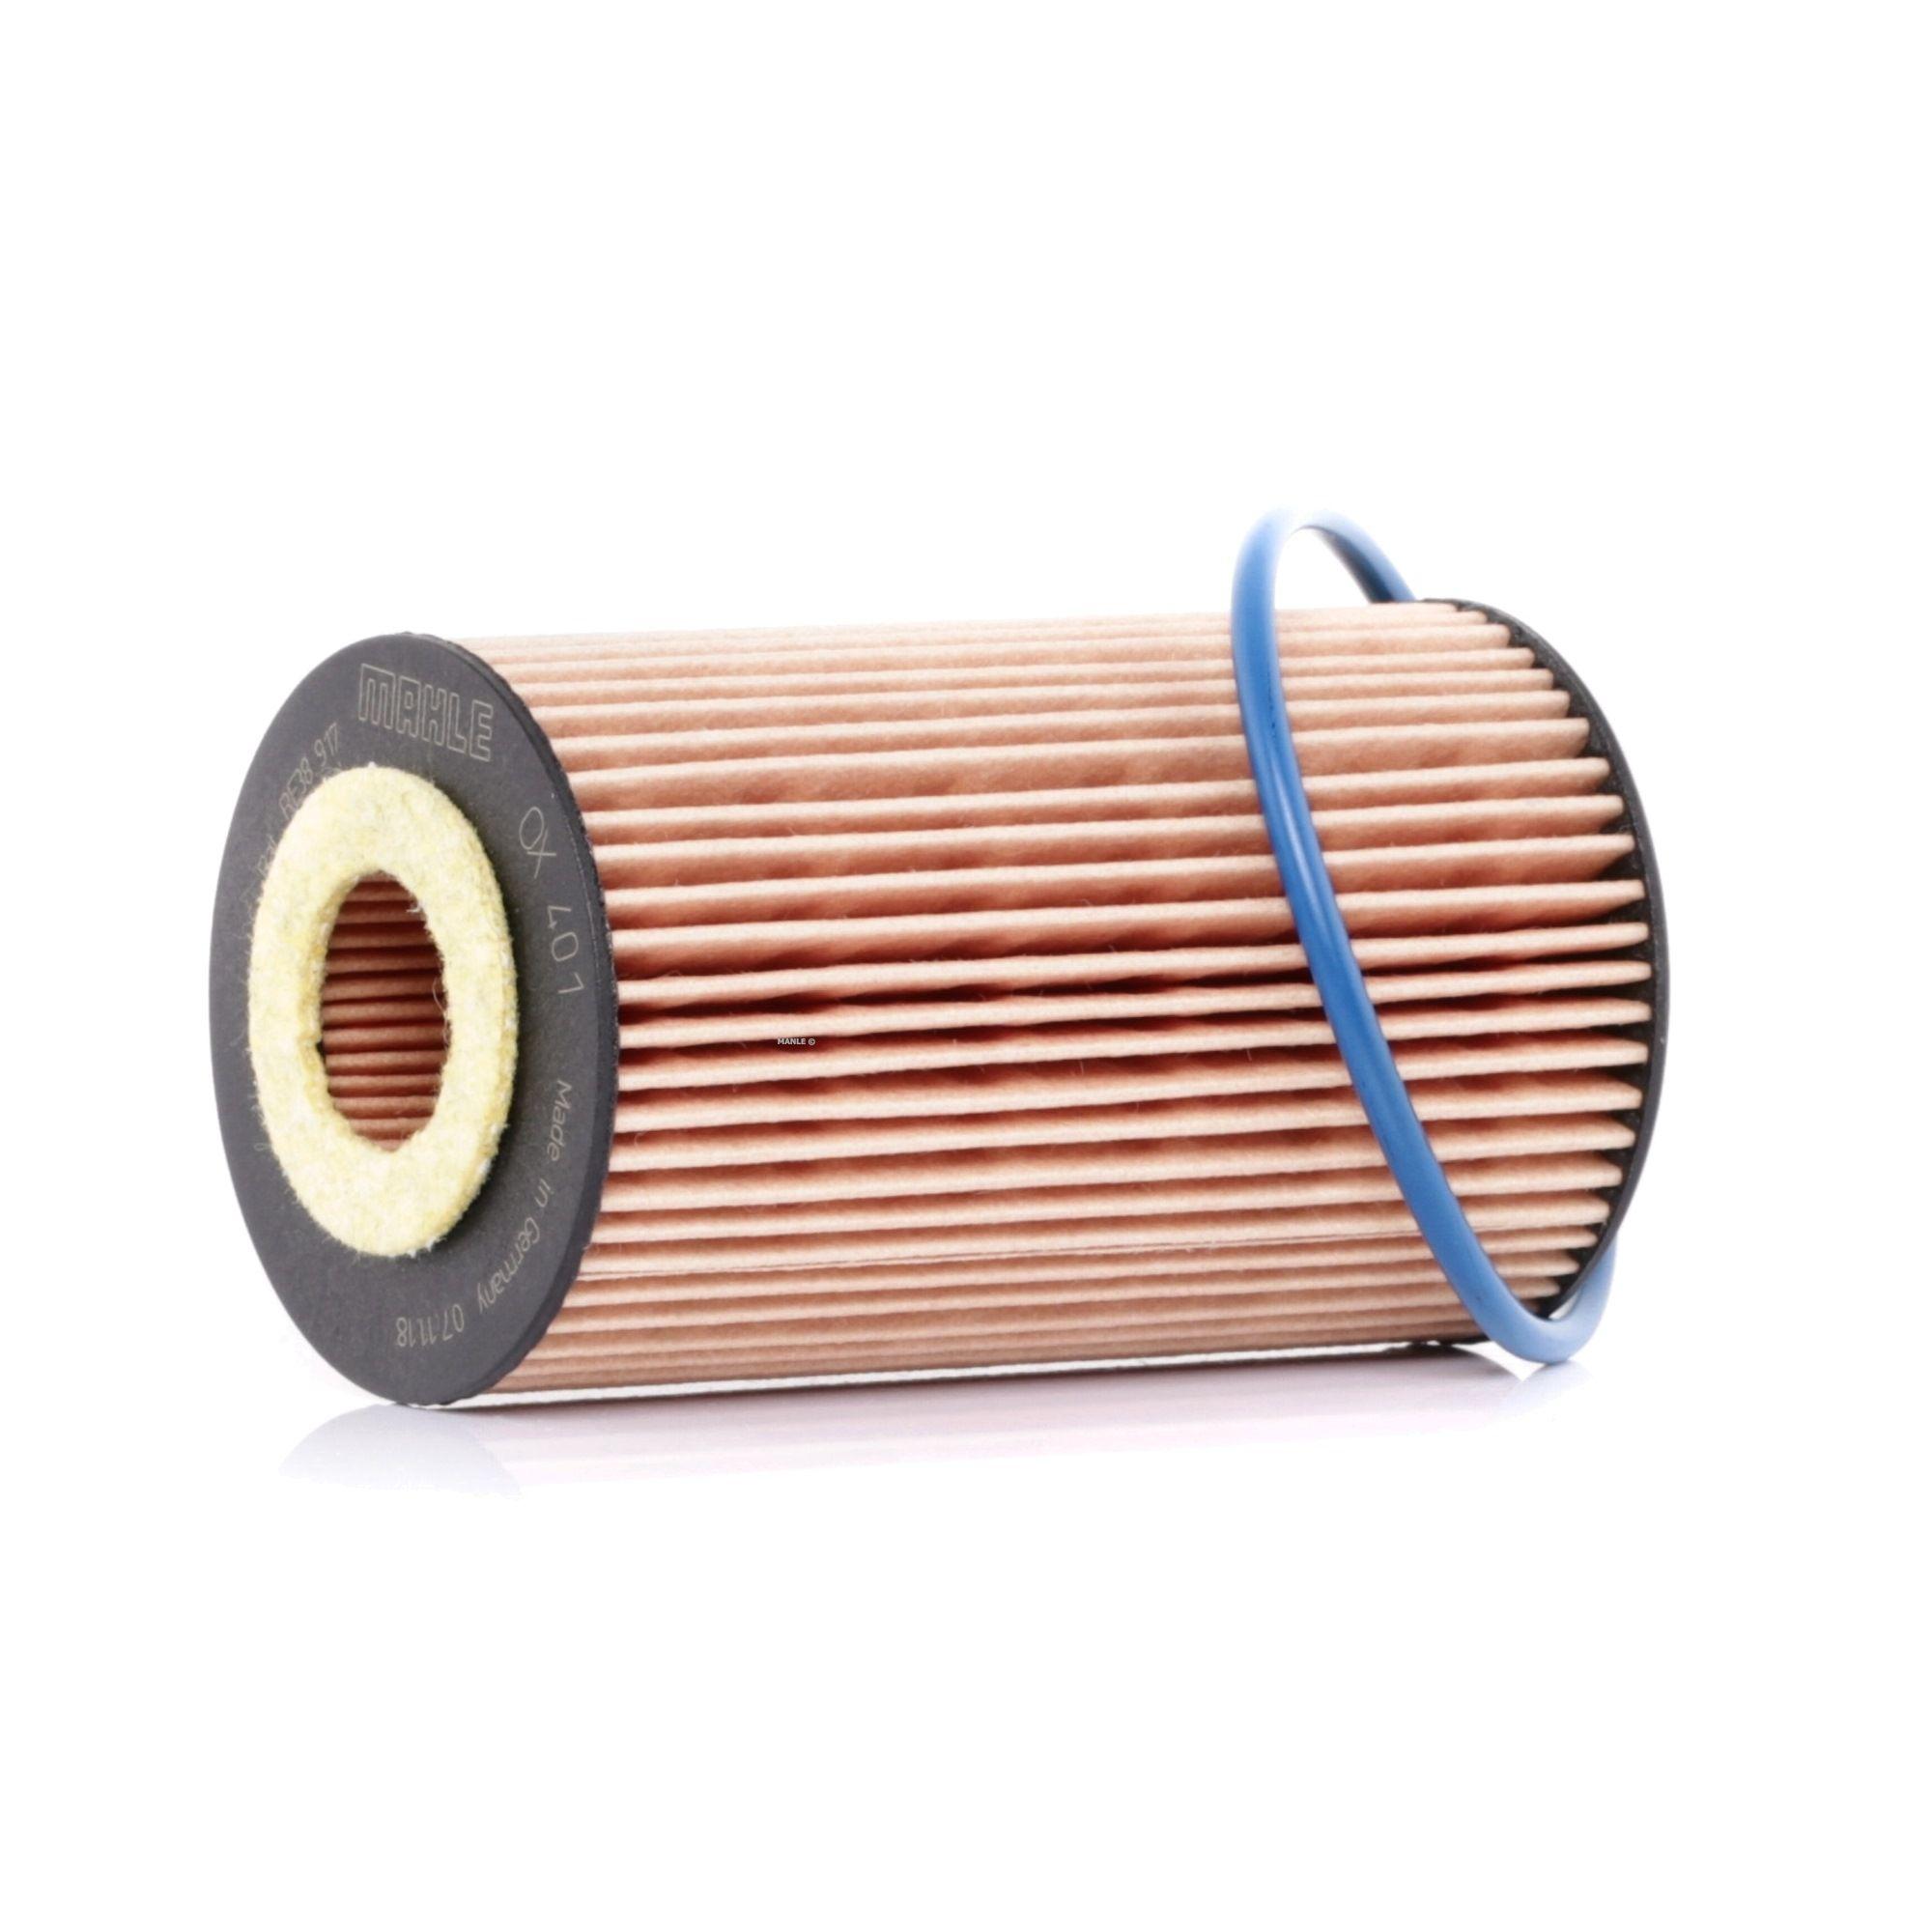 Olejový filter OX 401D OPEL TIGRA v zľave – kupujte hneď!